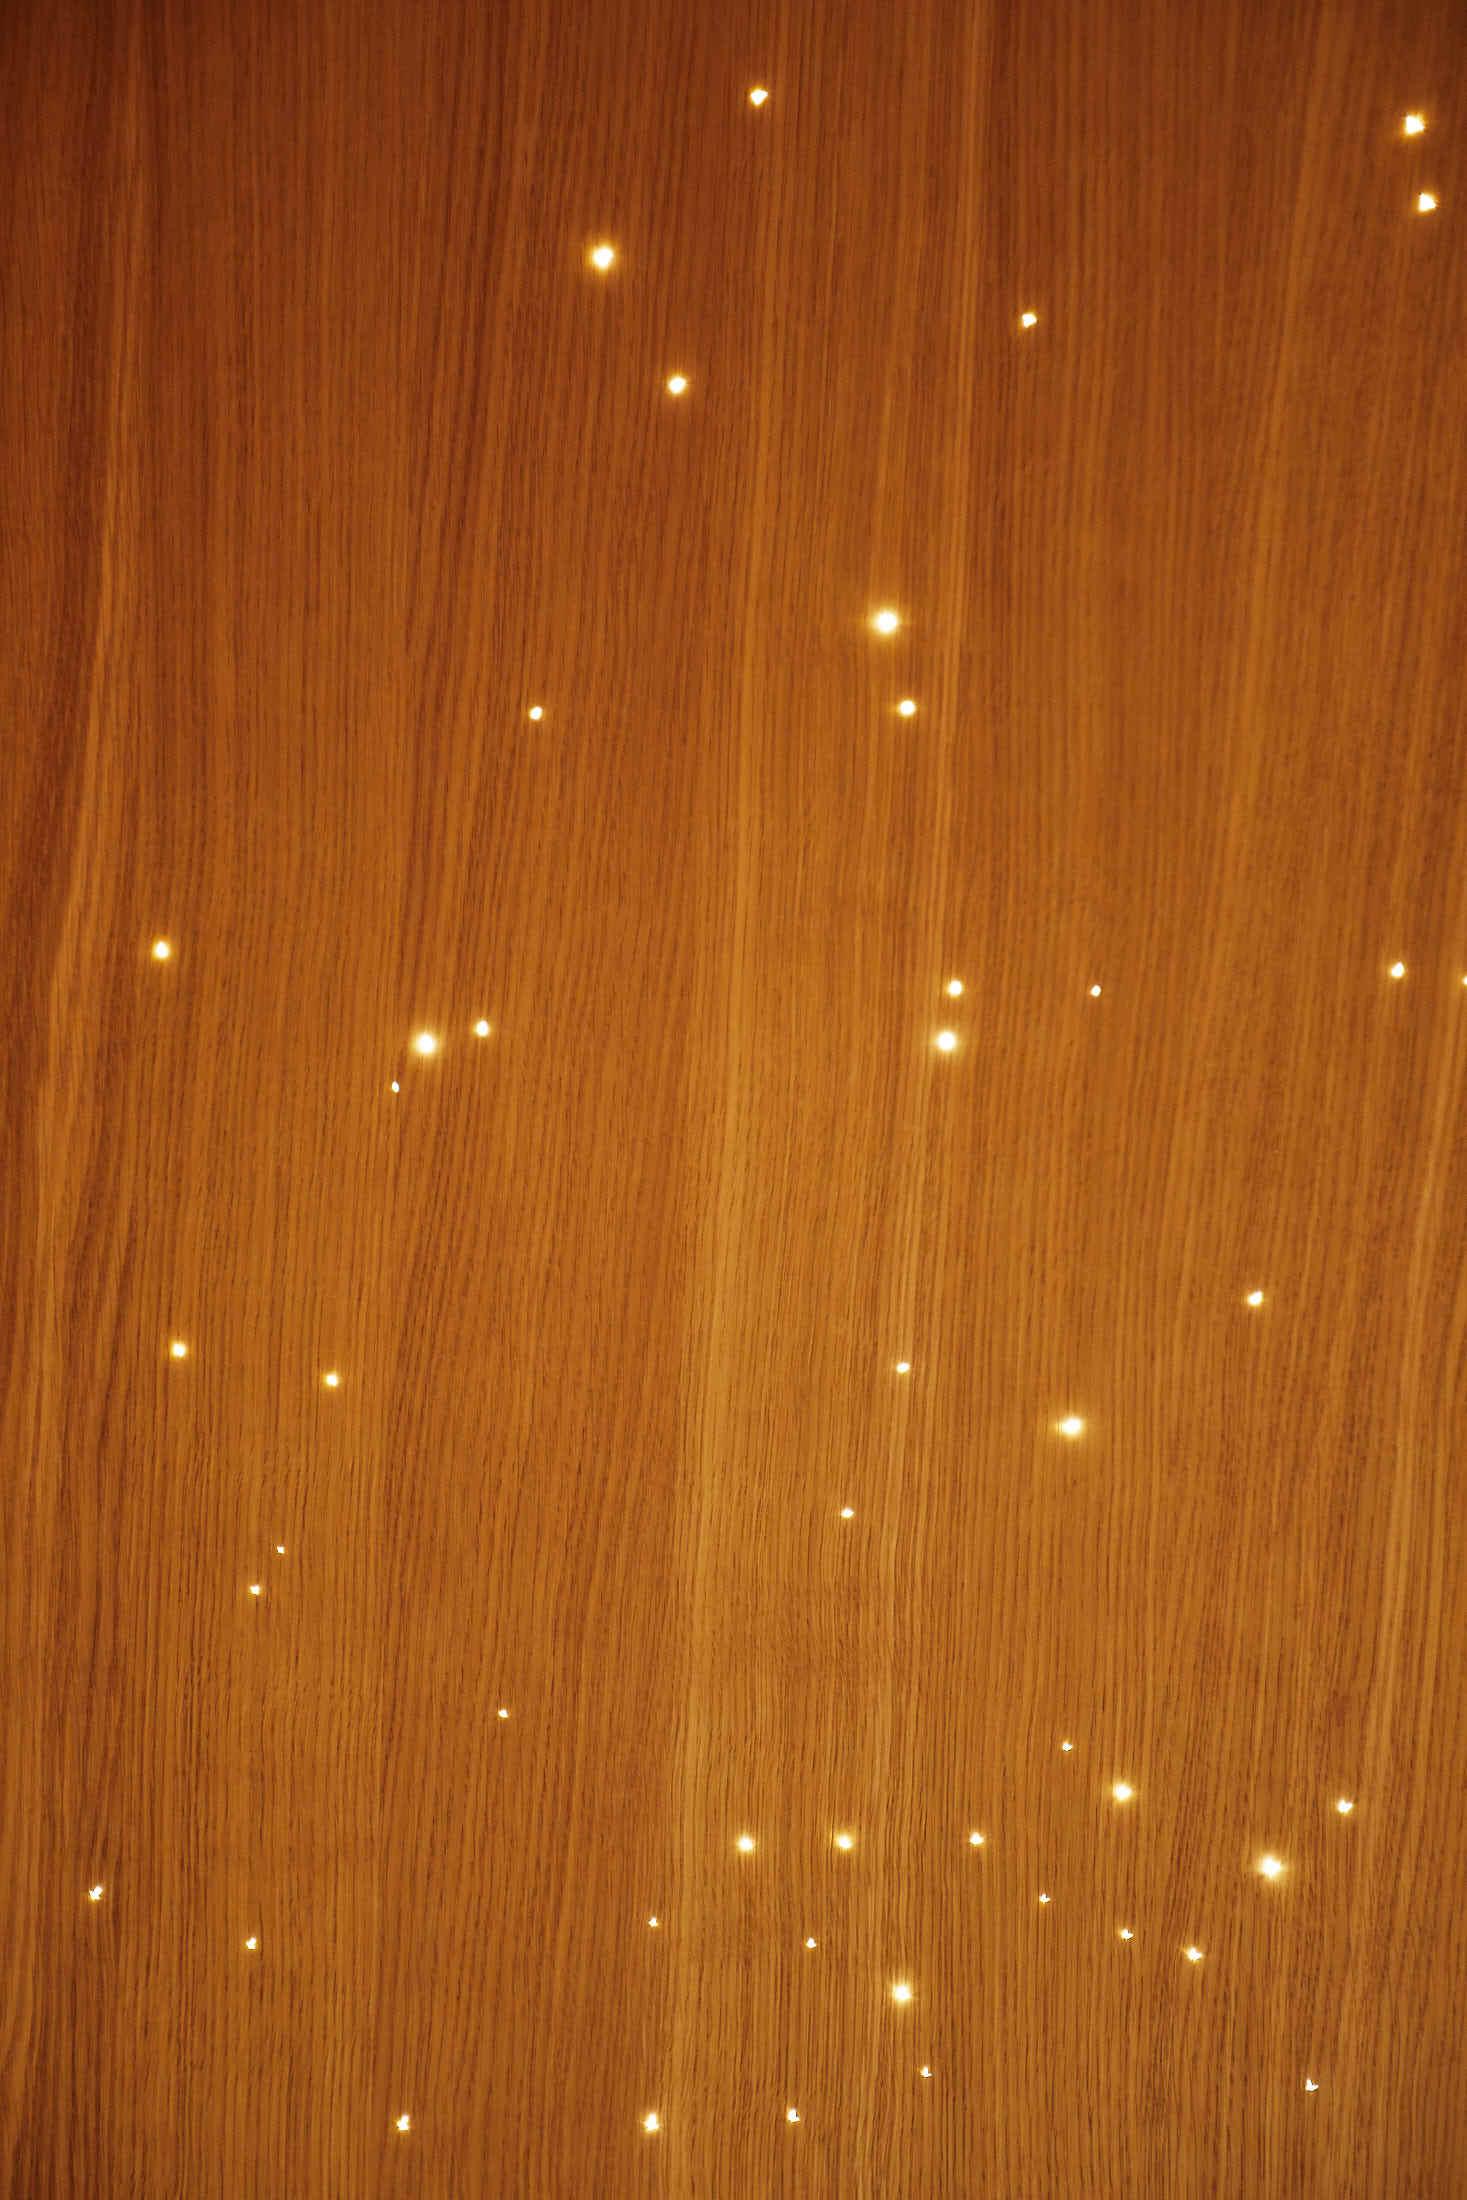 Sternenhimmel Detail